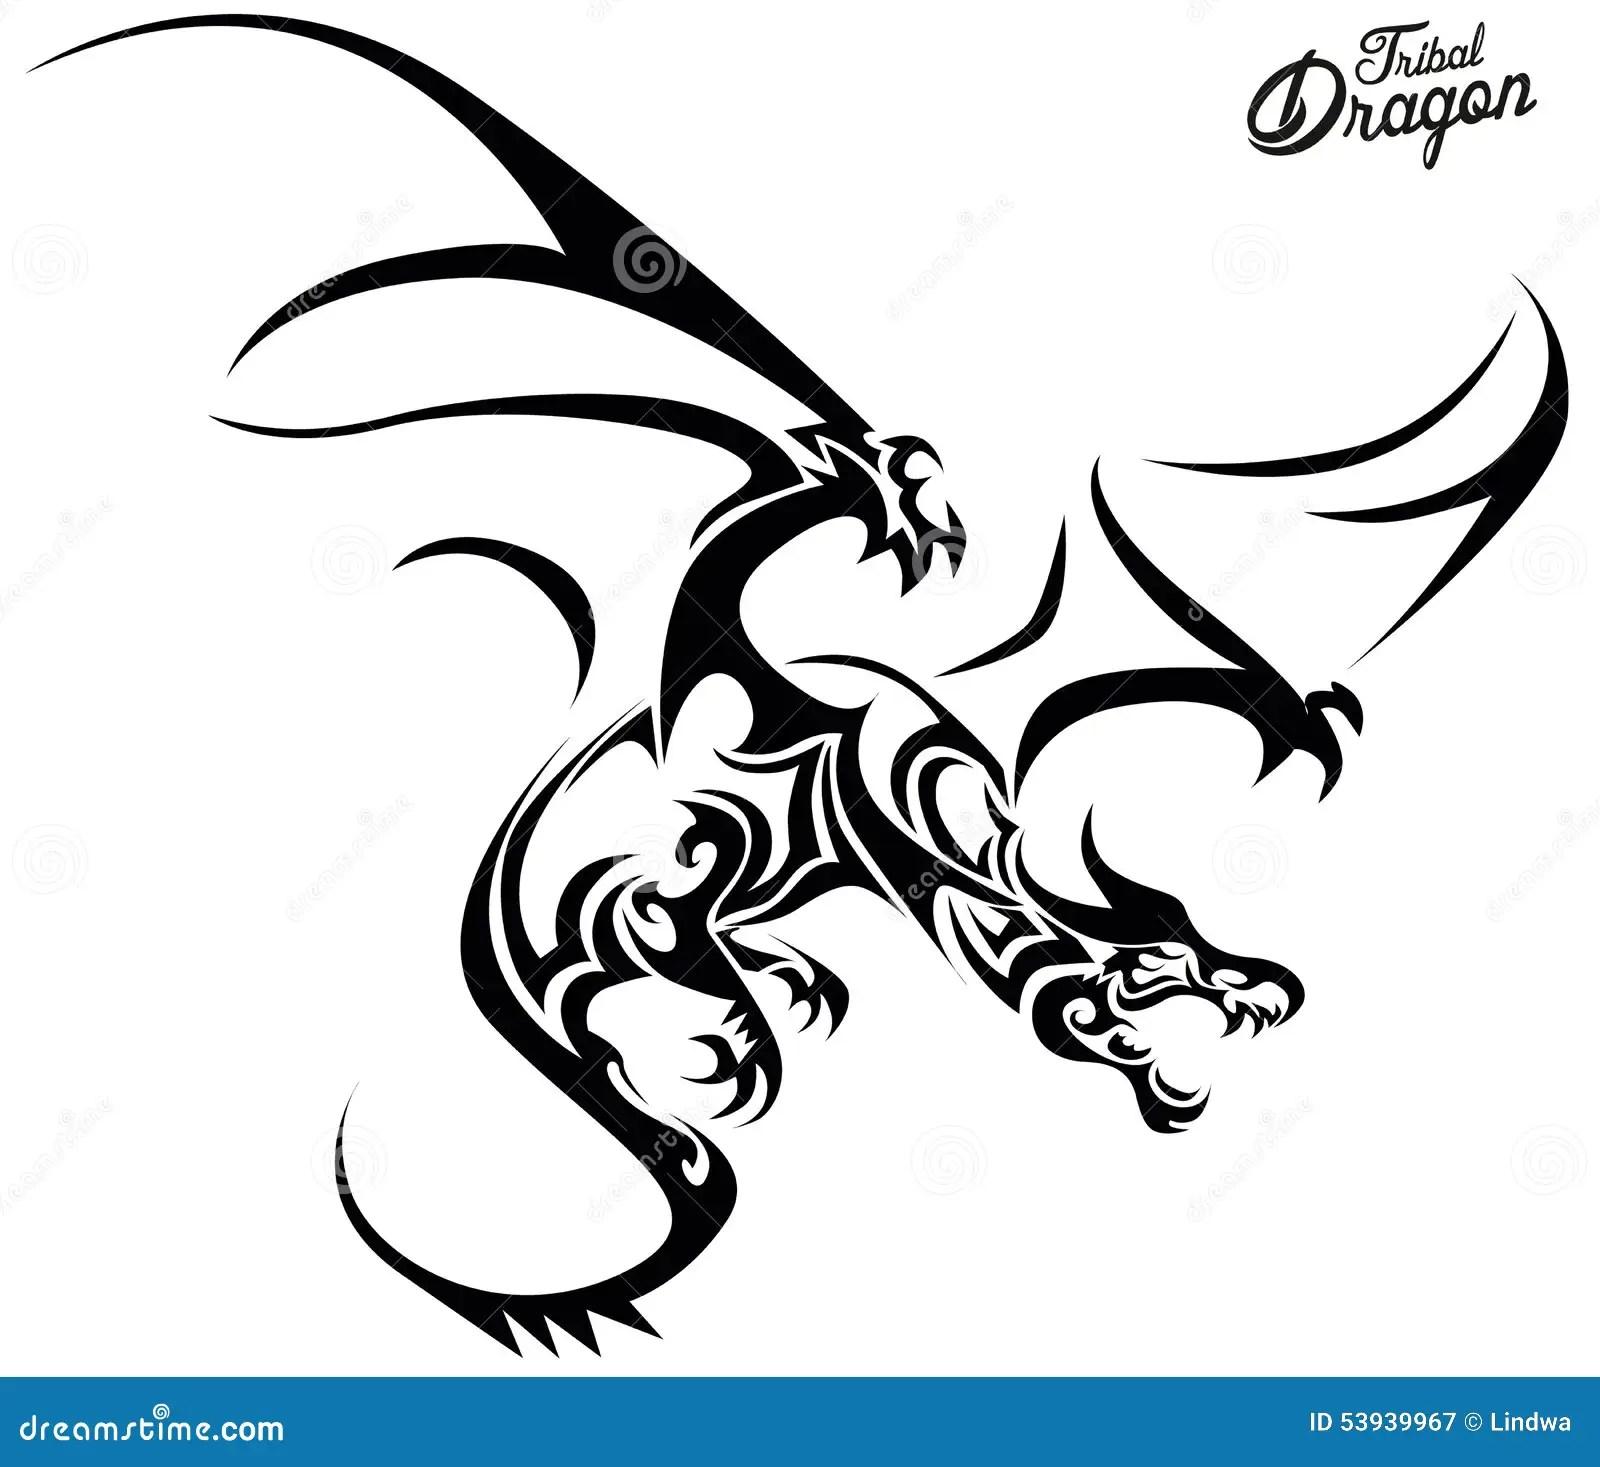 Tribal Dragon Stock Vector